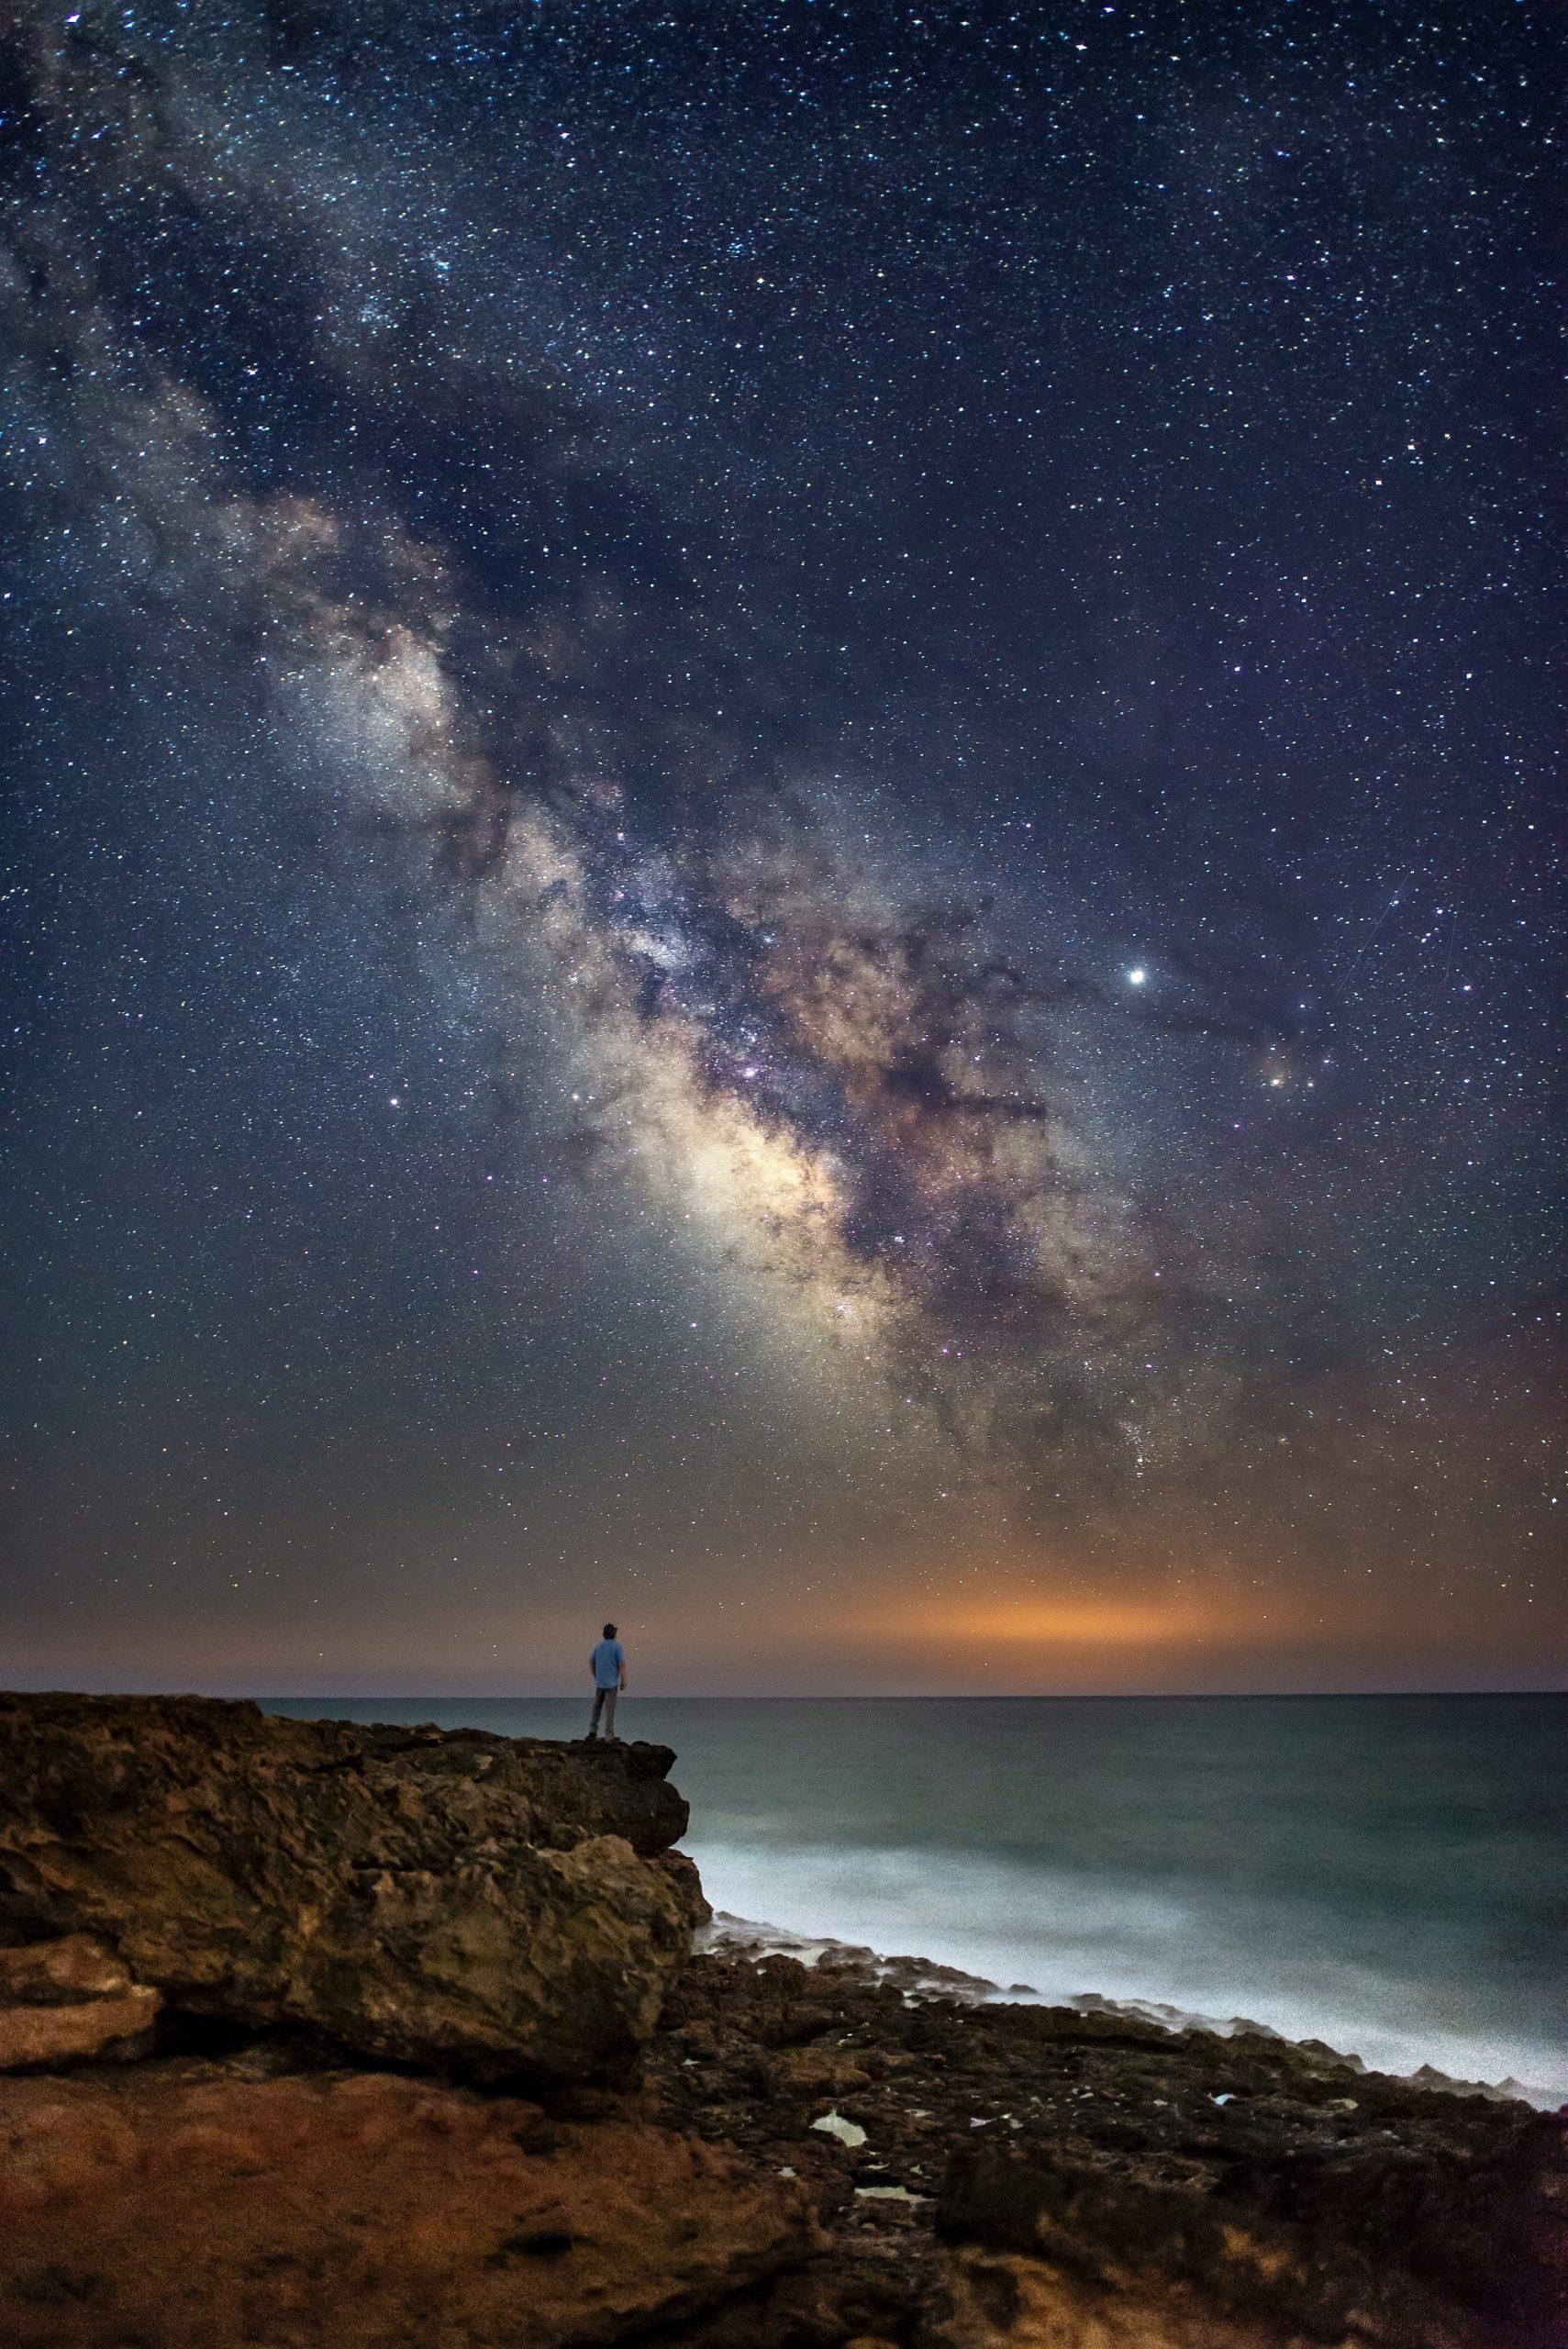 Sternhimmel am Meer